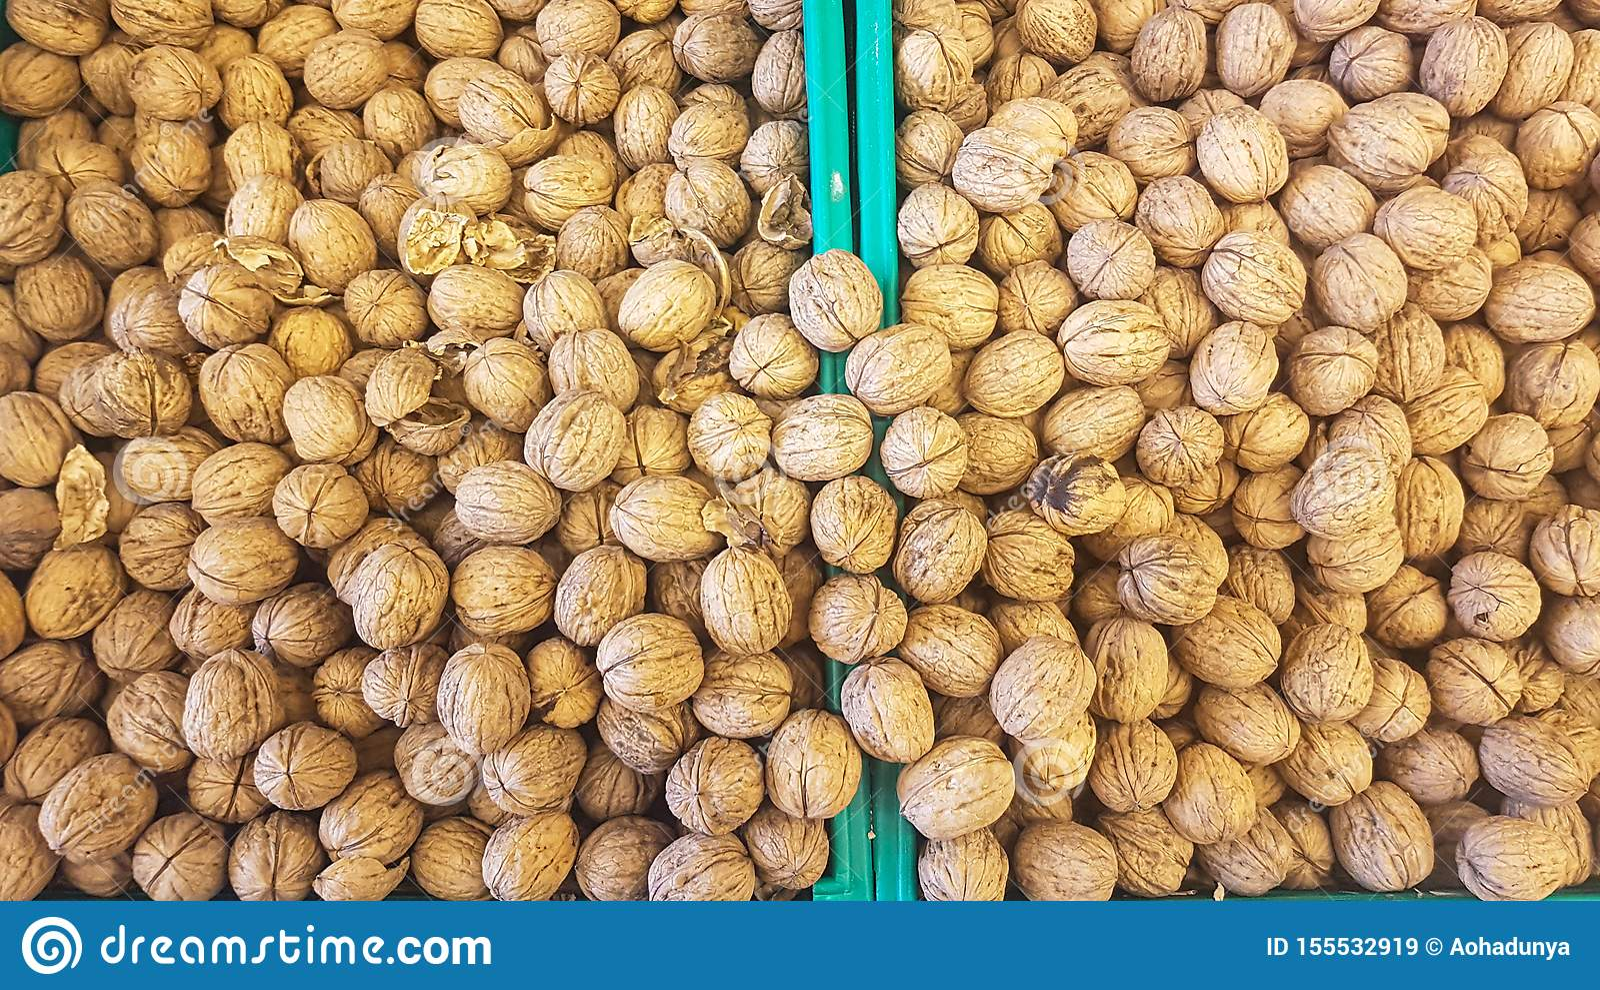 Brown inshell walnuts in the fresh vegan market